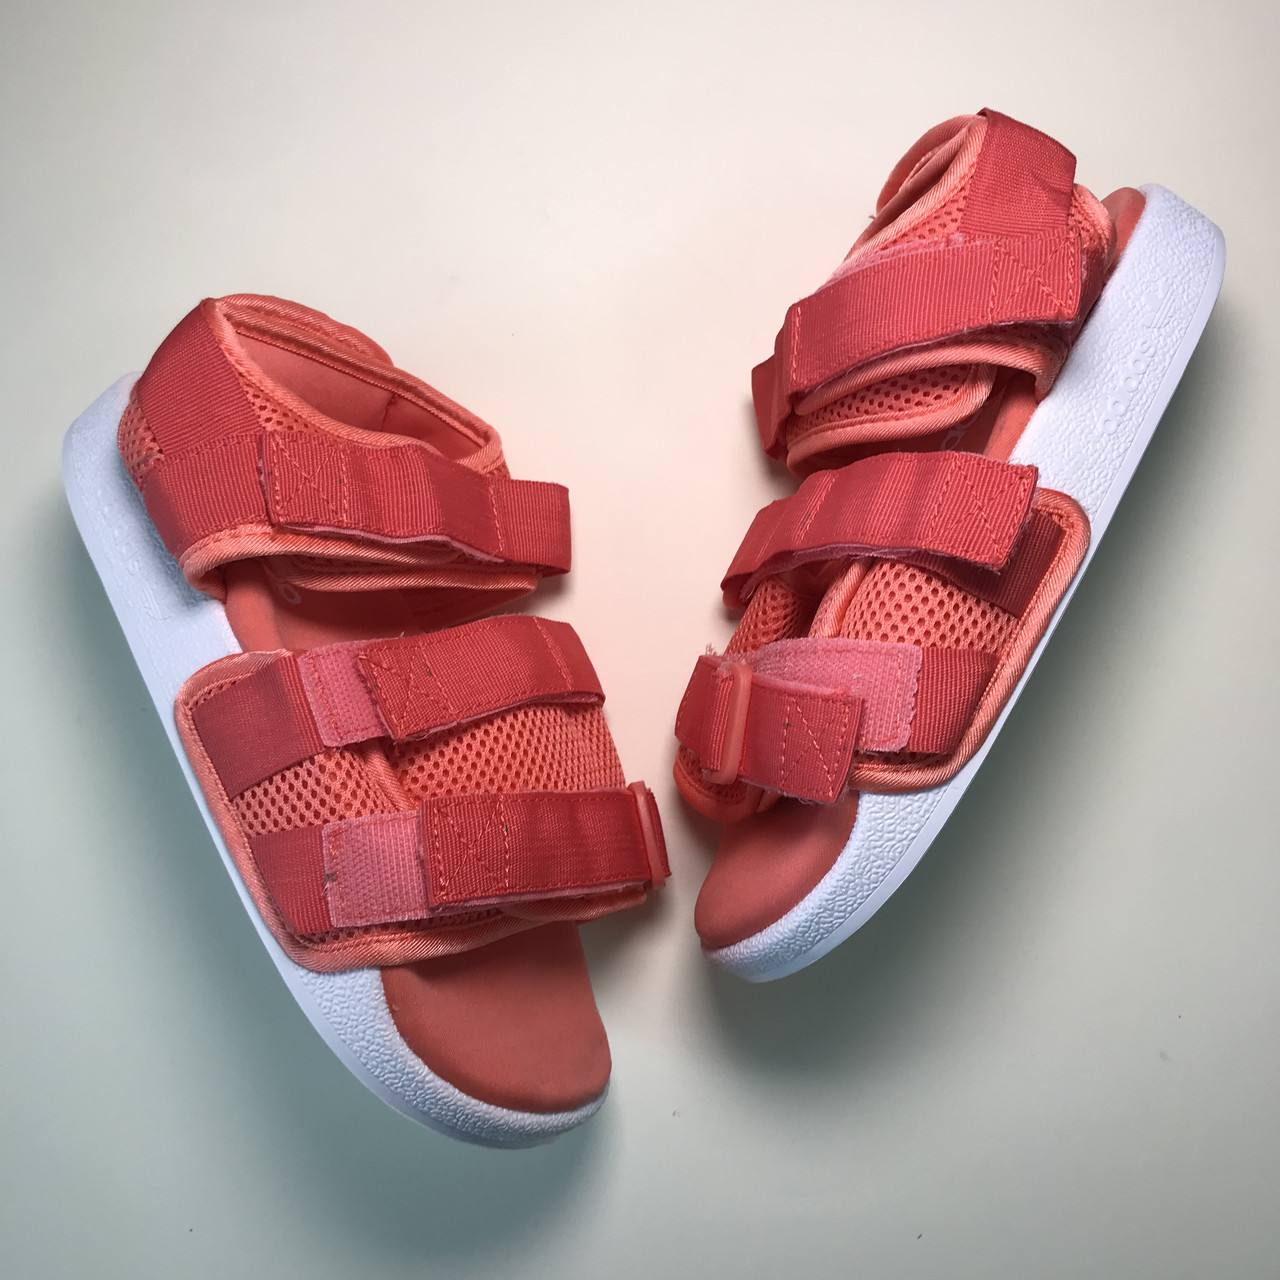 Сандалии Adidas Adilette Corral / Сандалии Адидас Коралловые